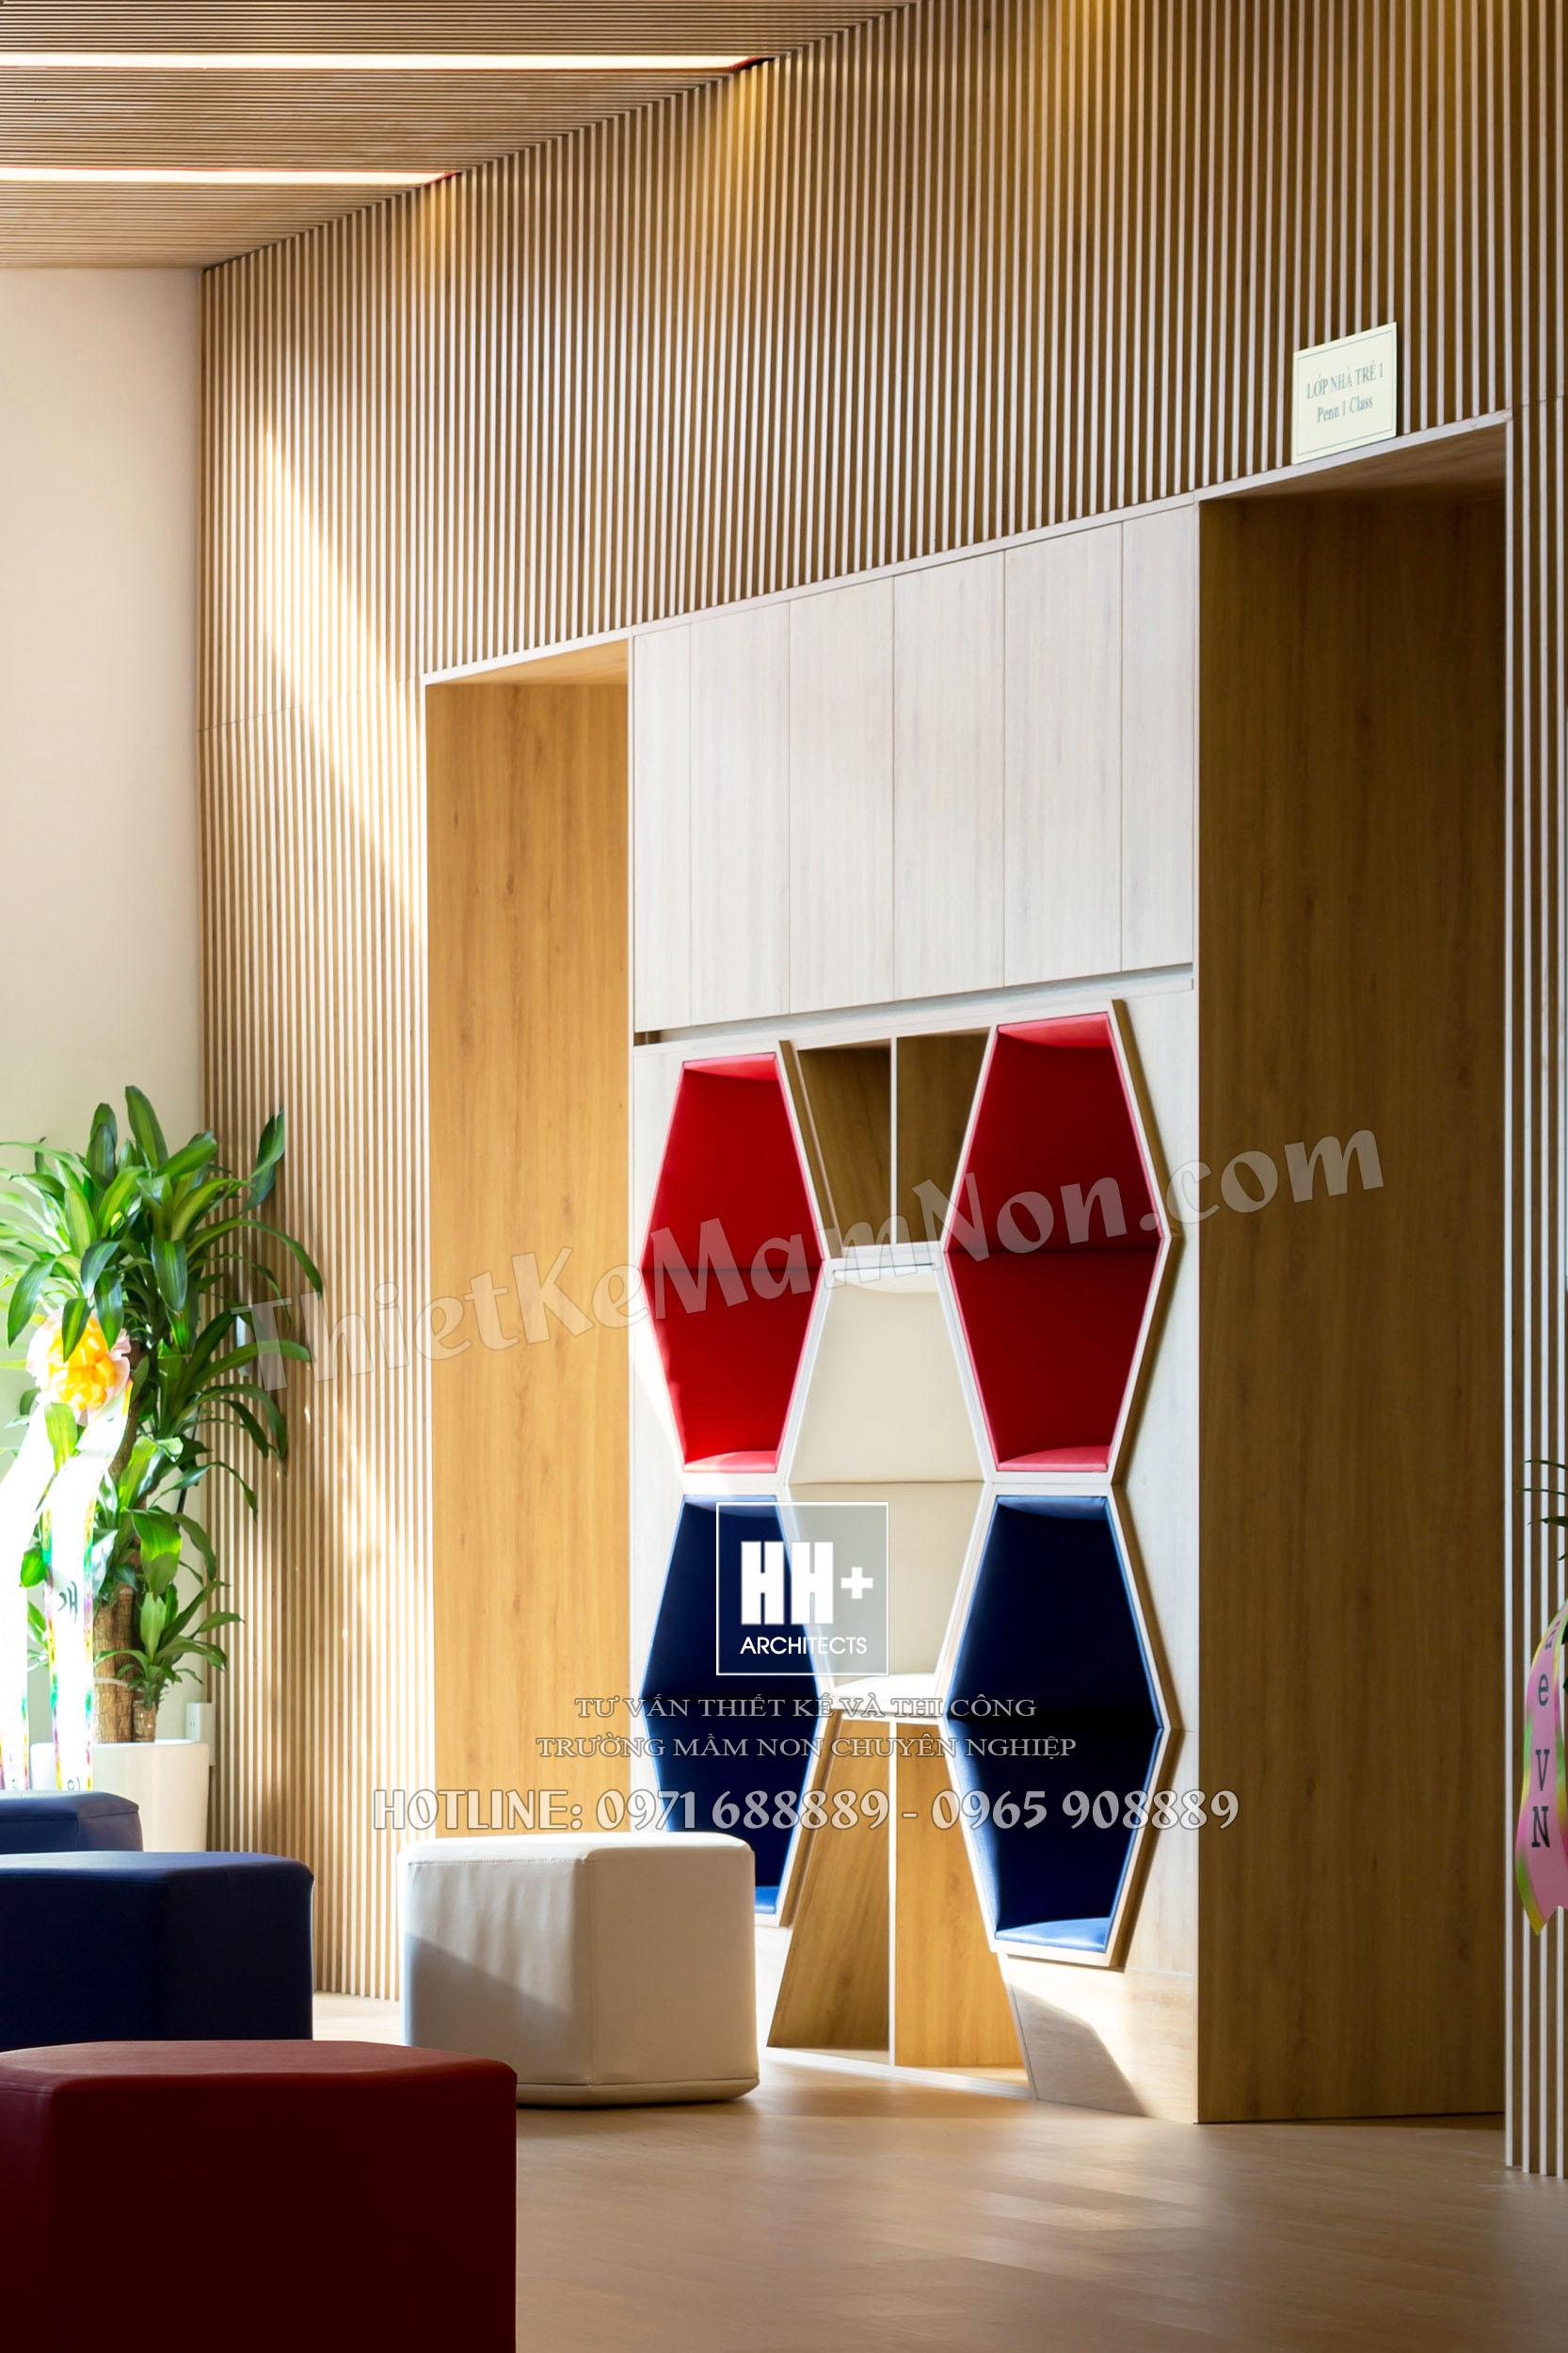 Rosemont_sinhhoatchung_10 thiết kế trường mầm non Thiết kế trường mầm non Quốc Tế MỸ ROSEMONT Rosemont sinhhoatchung 10